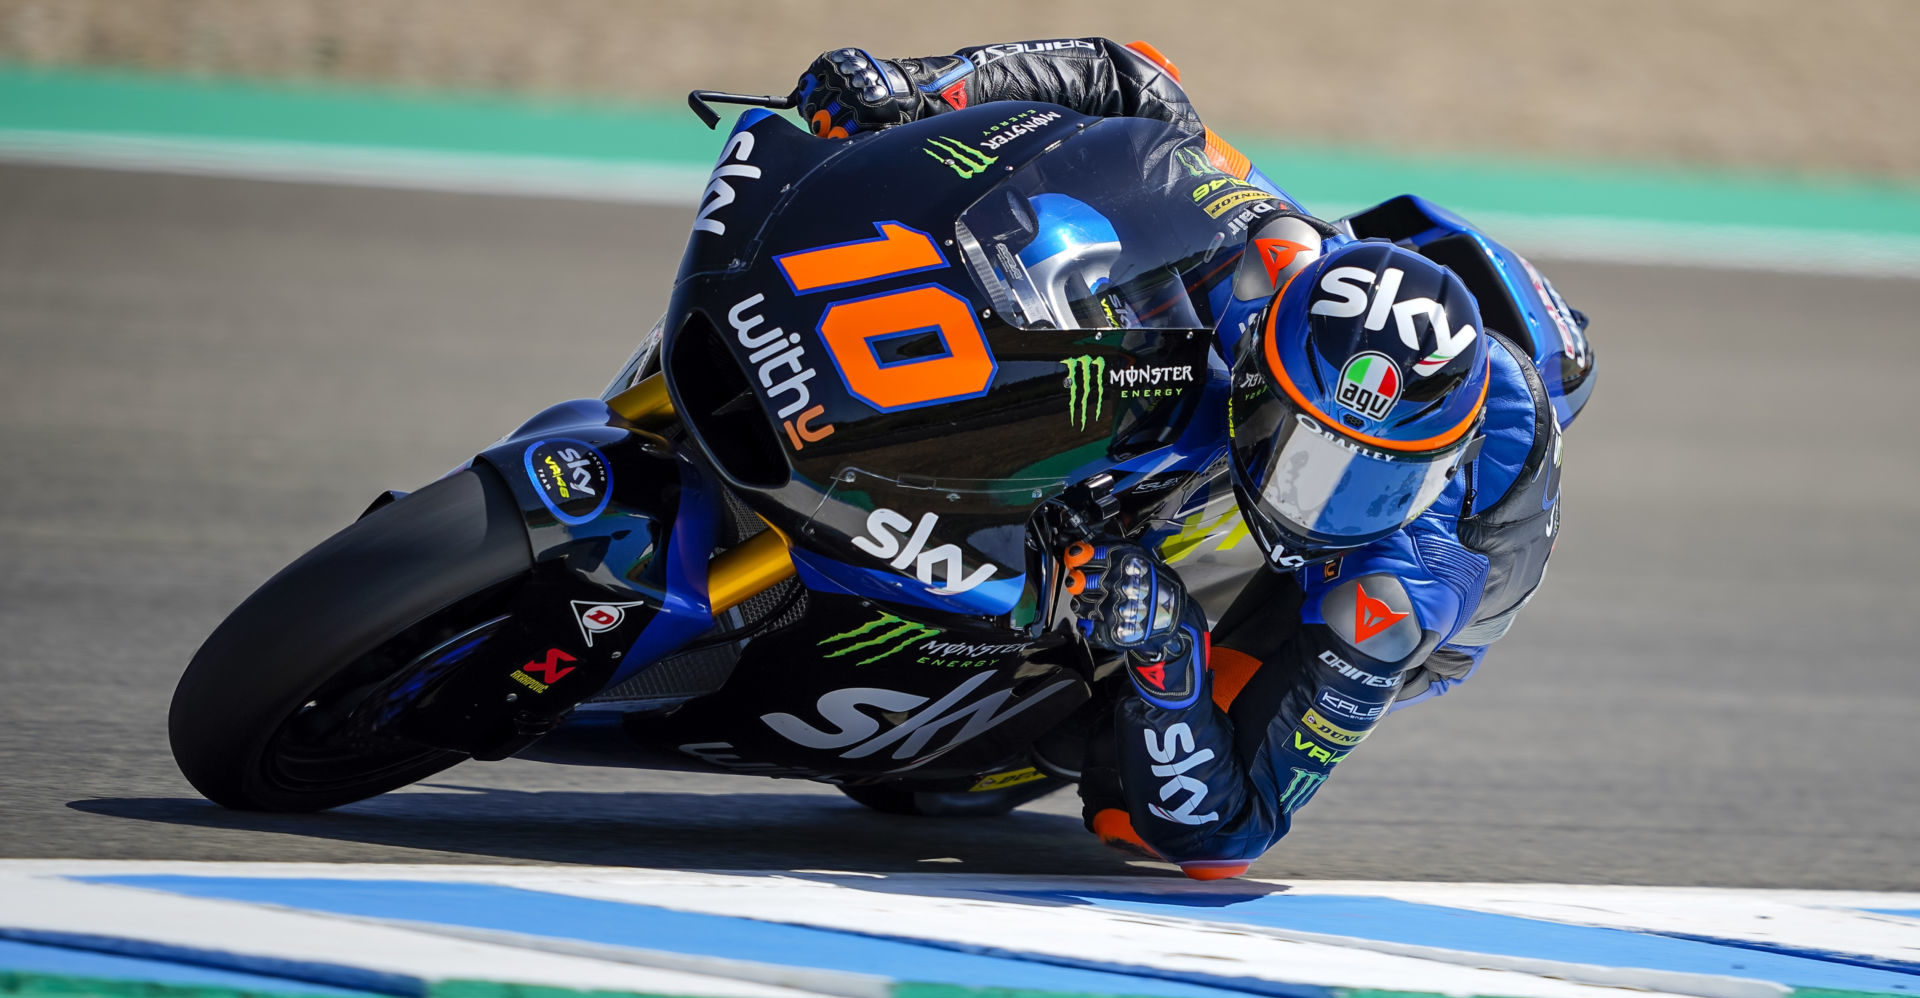 Moto2: Luca Marini Quickest, Joe Roberts 9th In FP1 At Jerez - Roadracing  World Magazine | Motorcycle Riding, Racing & Tech News